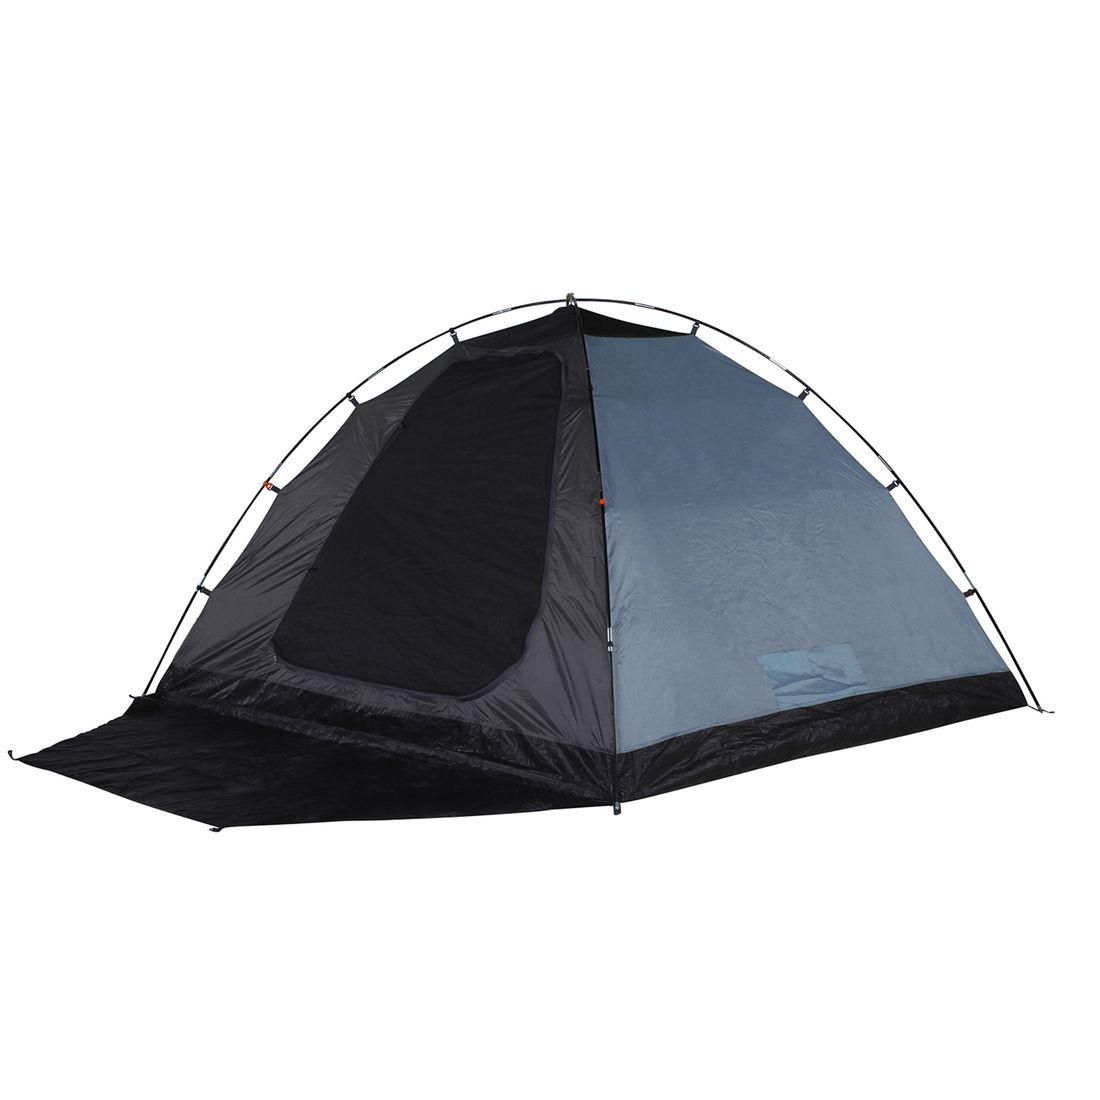 10T Glasgow 5 5 Personen Kuppelzelt, Campingzelt mit